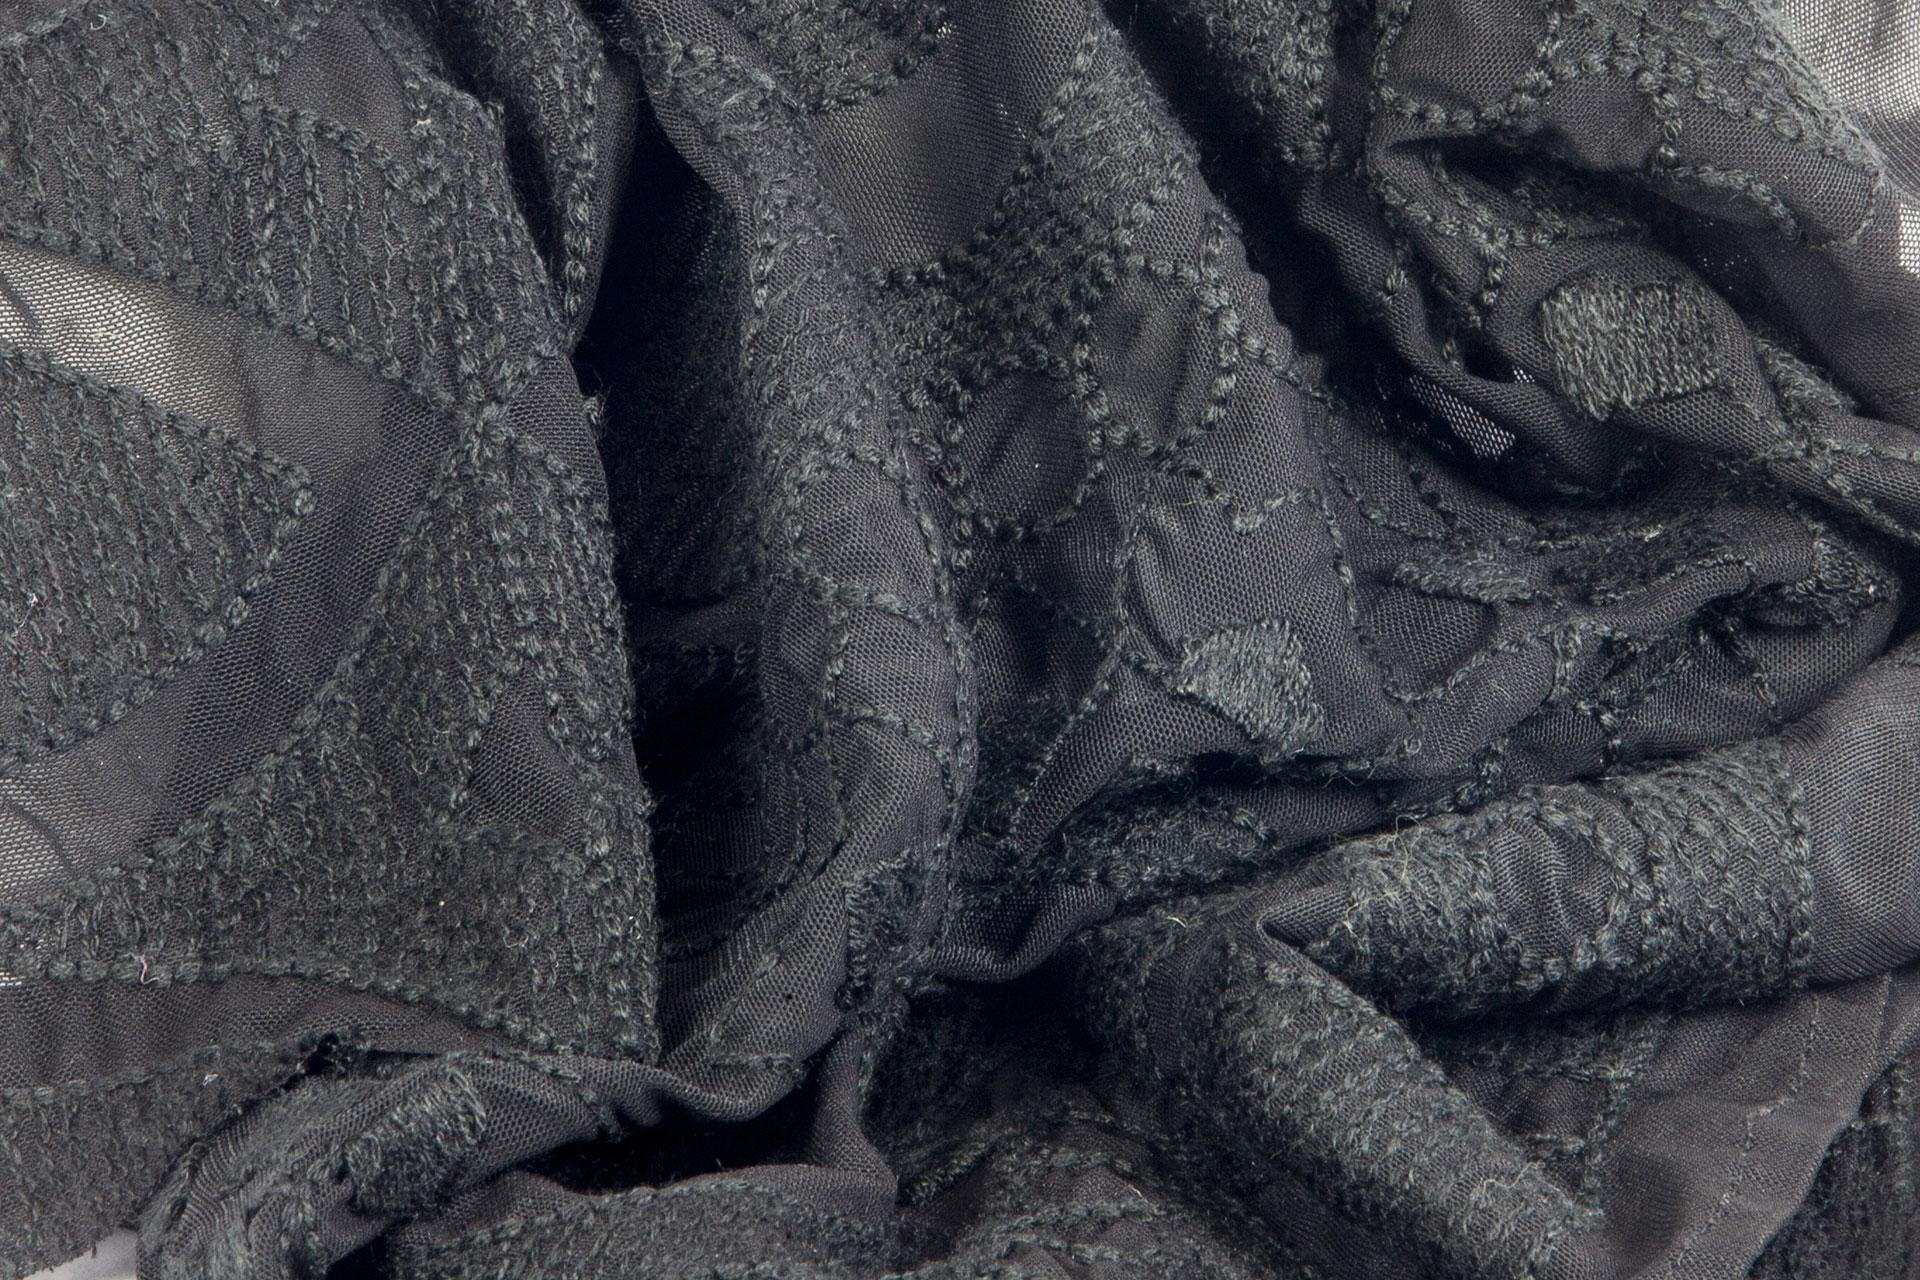 leggeri 02 - Ricami tessuti leggeri